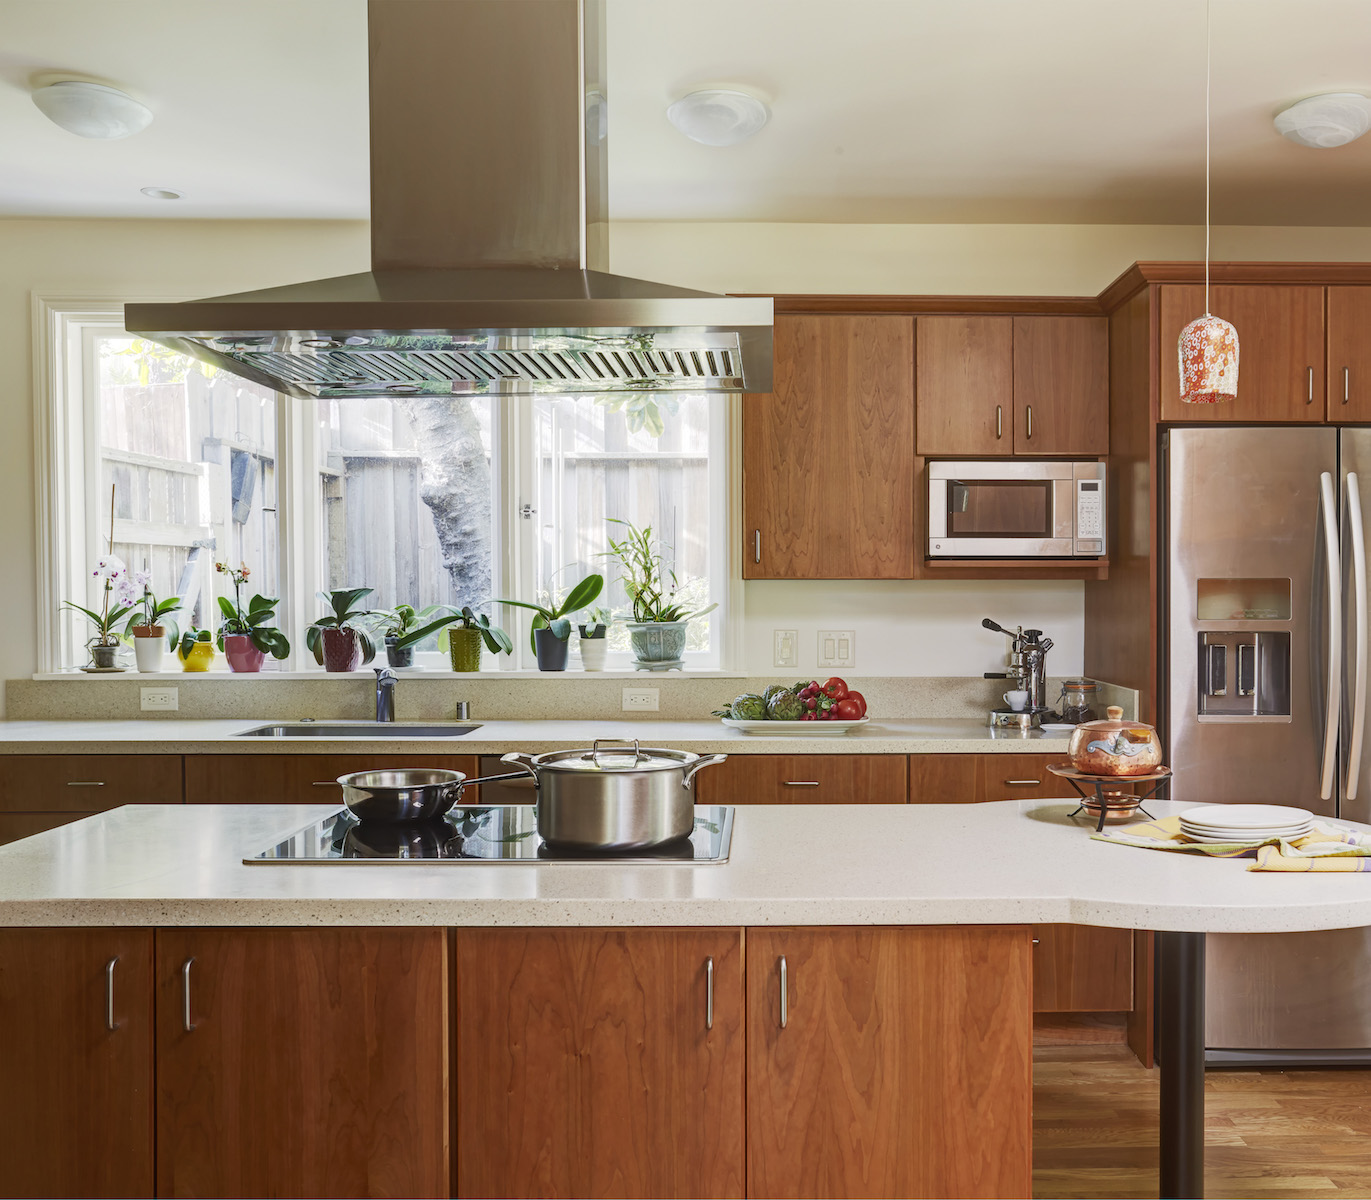 Custom kitchens by john wilkins - Kitchen